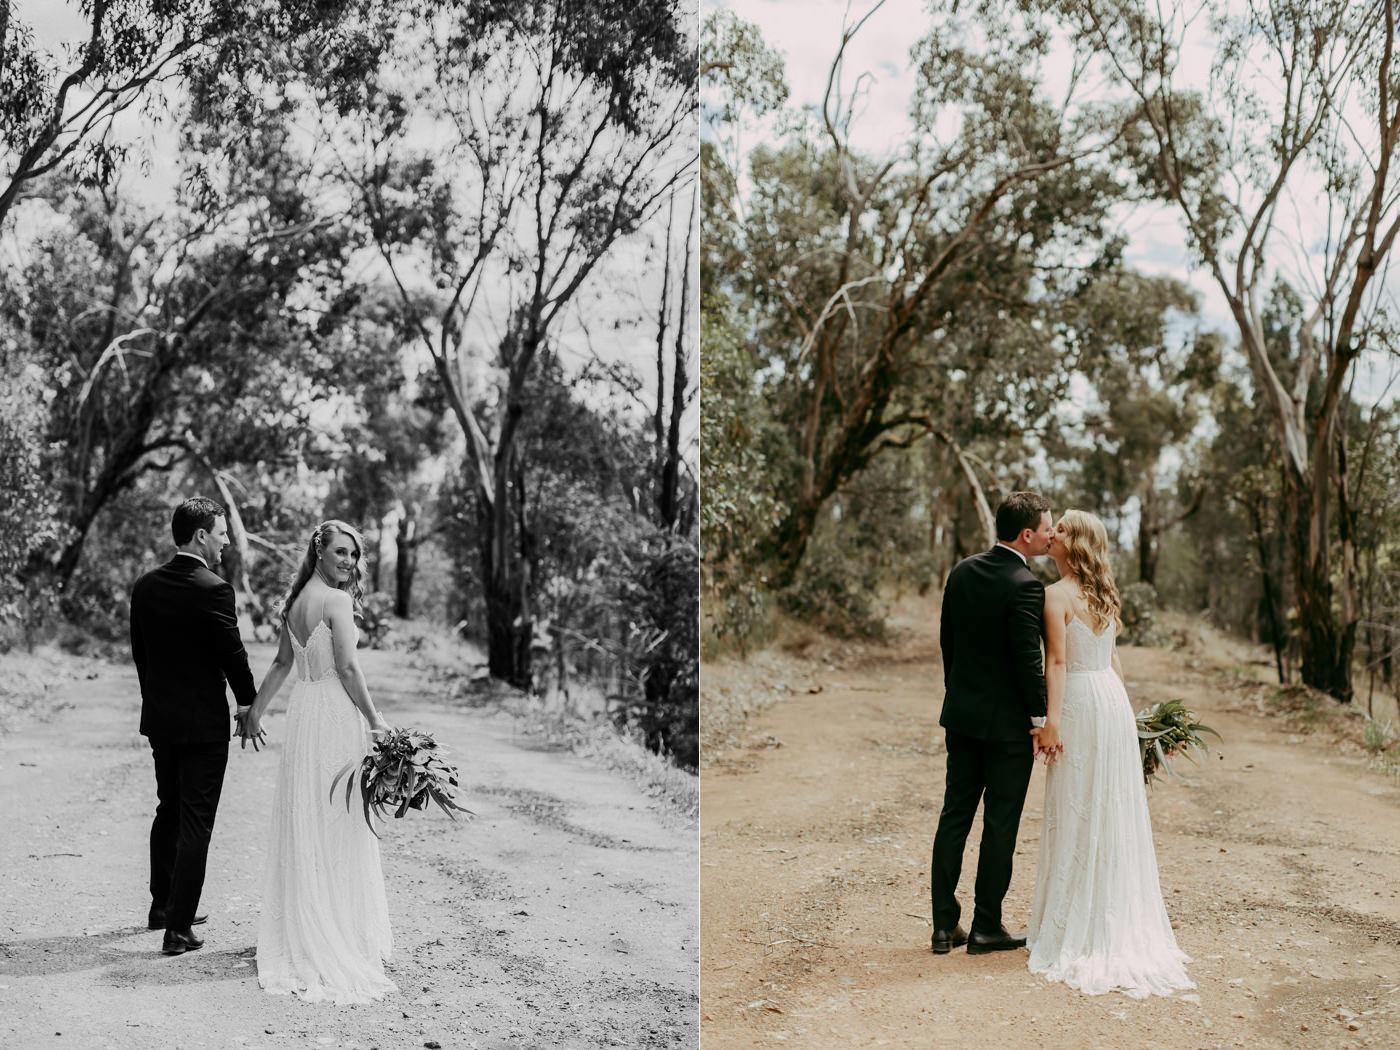 Anthony & Eliet - Wagga Wagga Wedding - Country NSW - Samantha Heather Photography-56.jpg